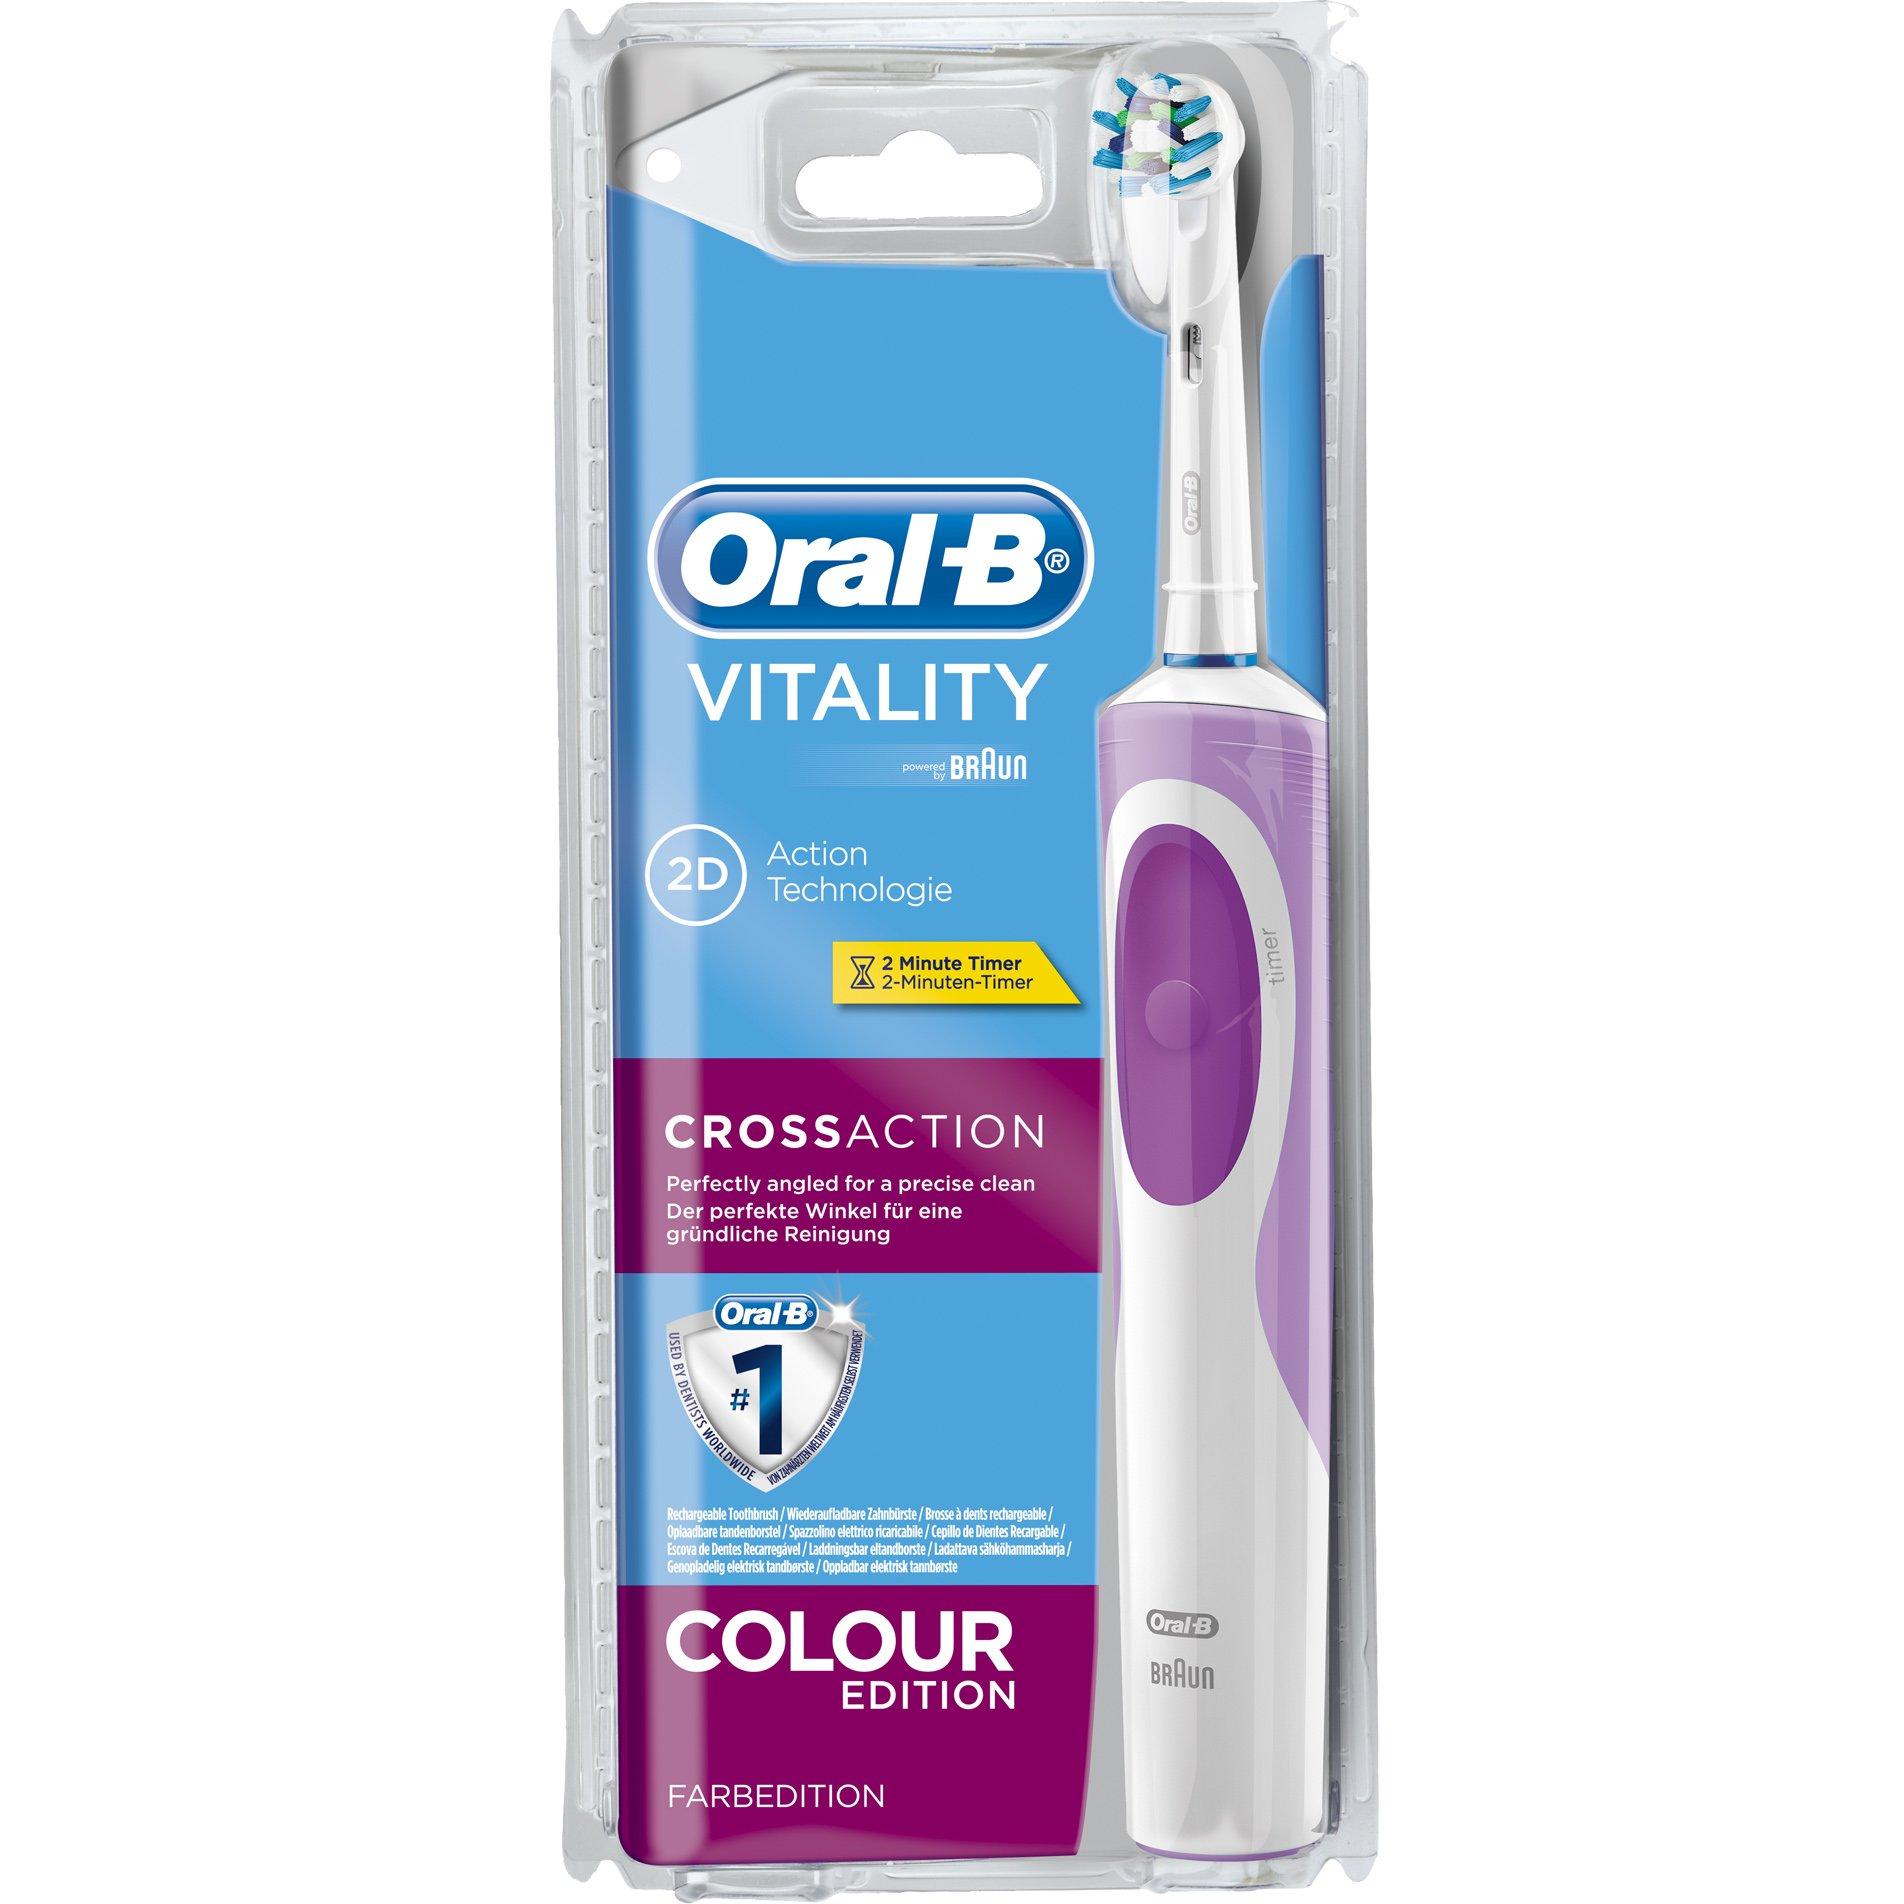 Oral B Vitality 2D Cross Action Colour Pink Edition Ηλεκτρική Οδοντόβουρτσα Τεχνολογία Καθαρισμού 2D σε Ροζ Χρώμα, 1τεμάχιο